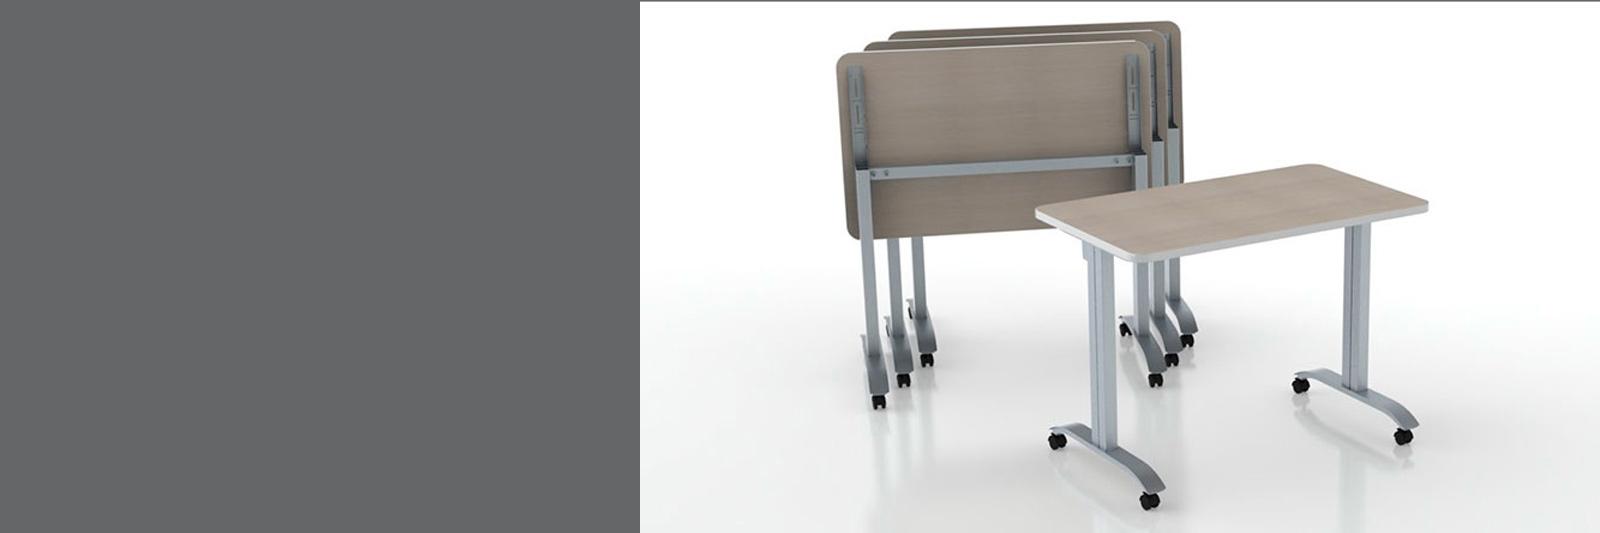 Металлокаркасы ПИЛОТ КОМПАКТ для складных столов